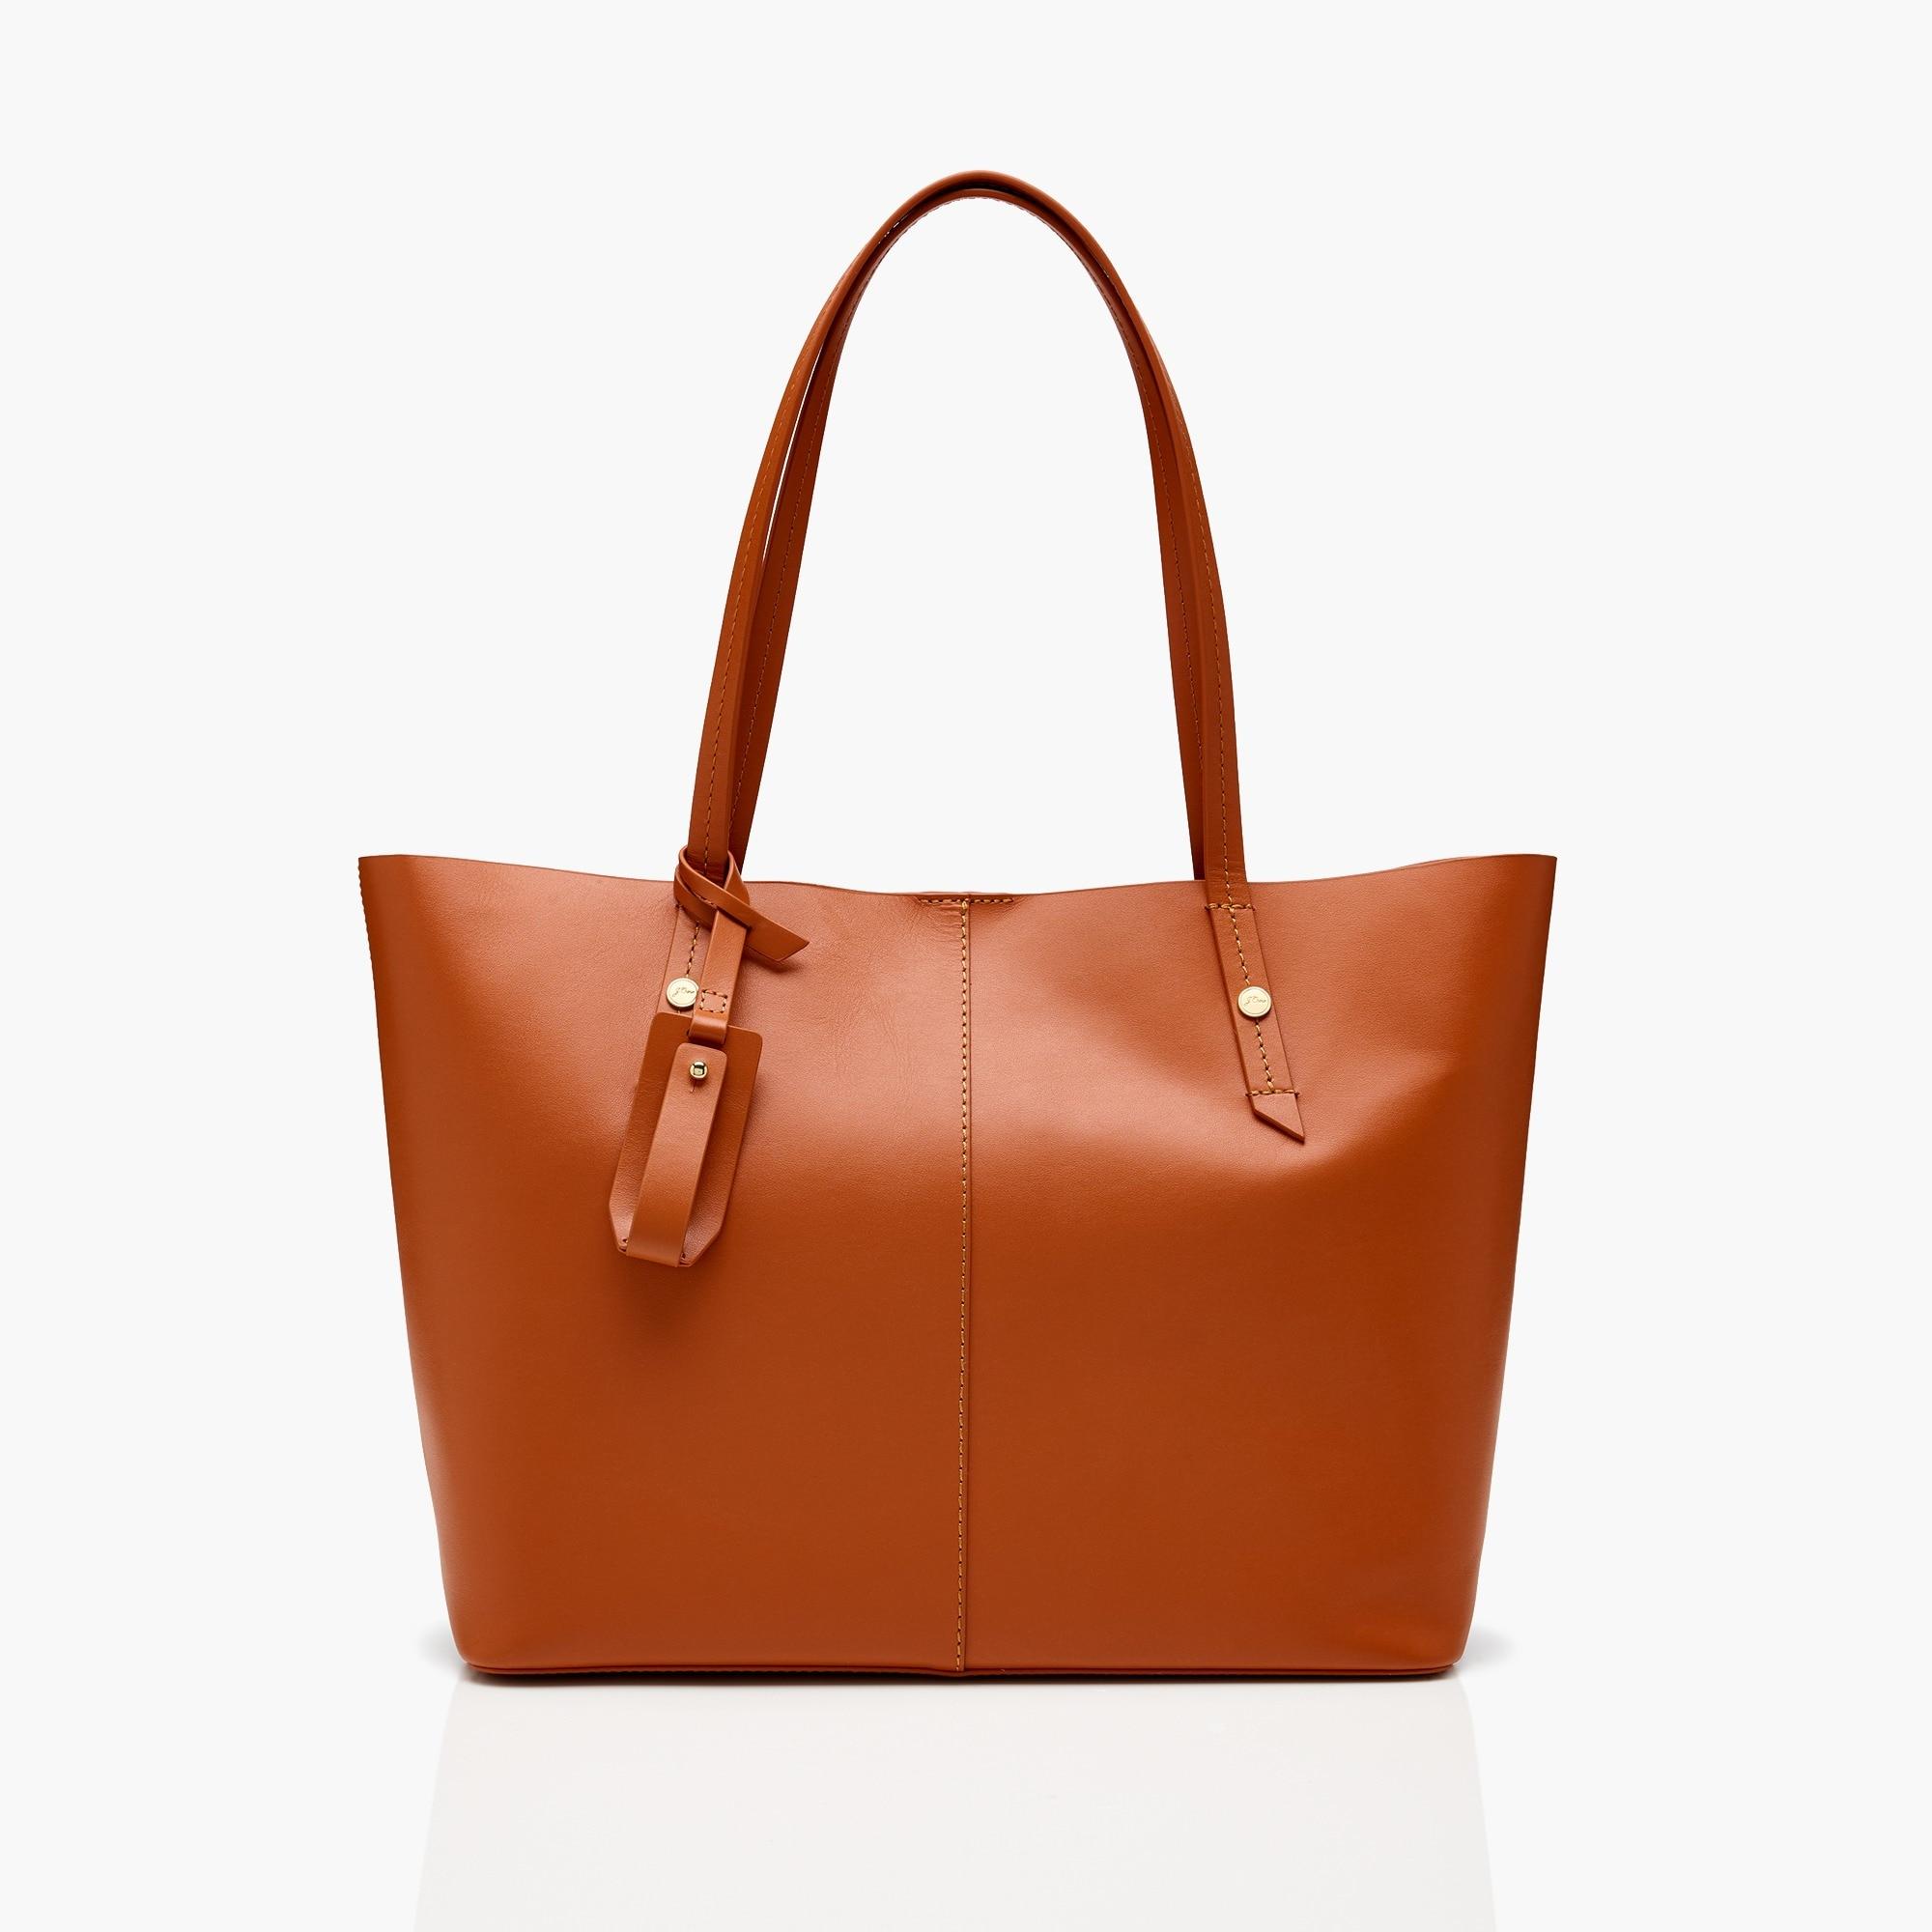 Women's Handbags, Totes & Clutches | J.Crew